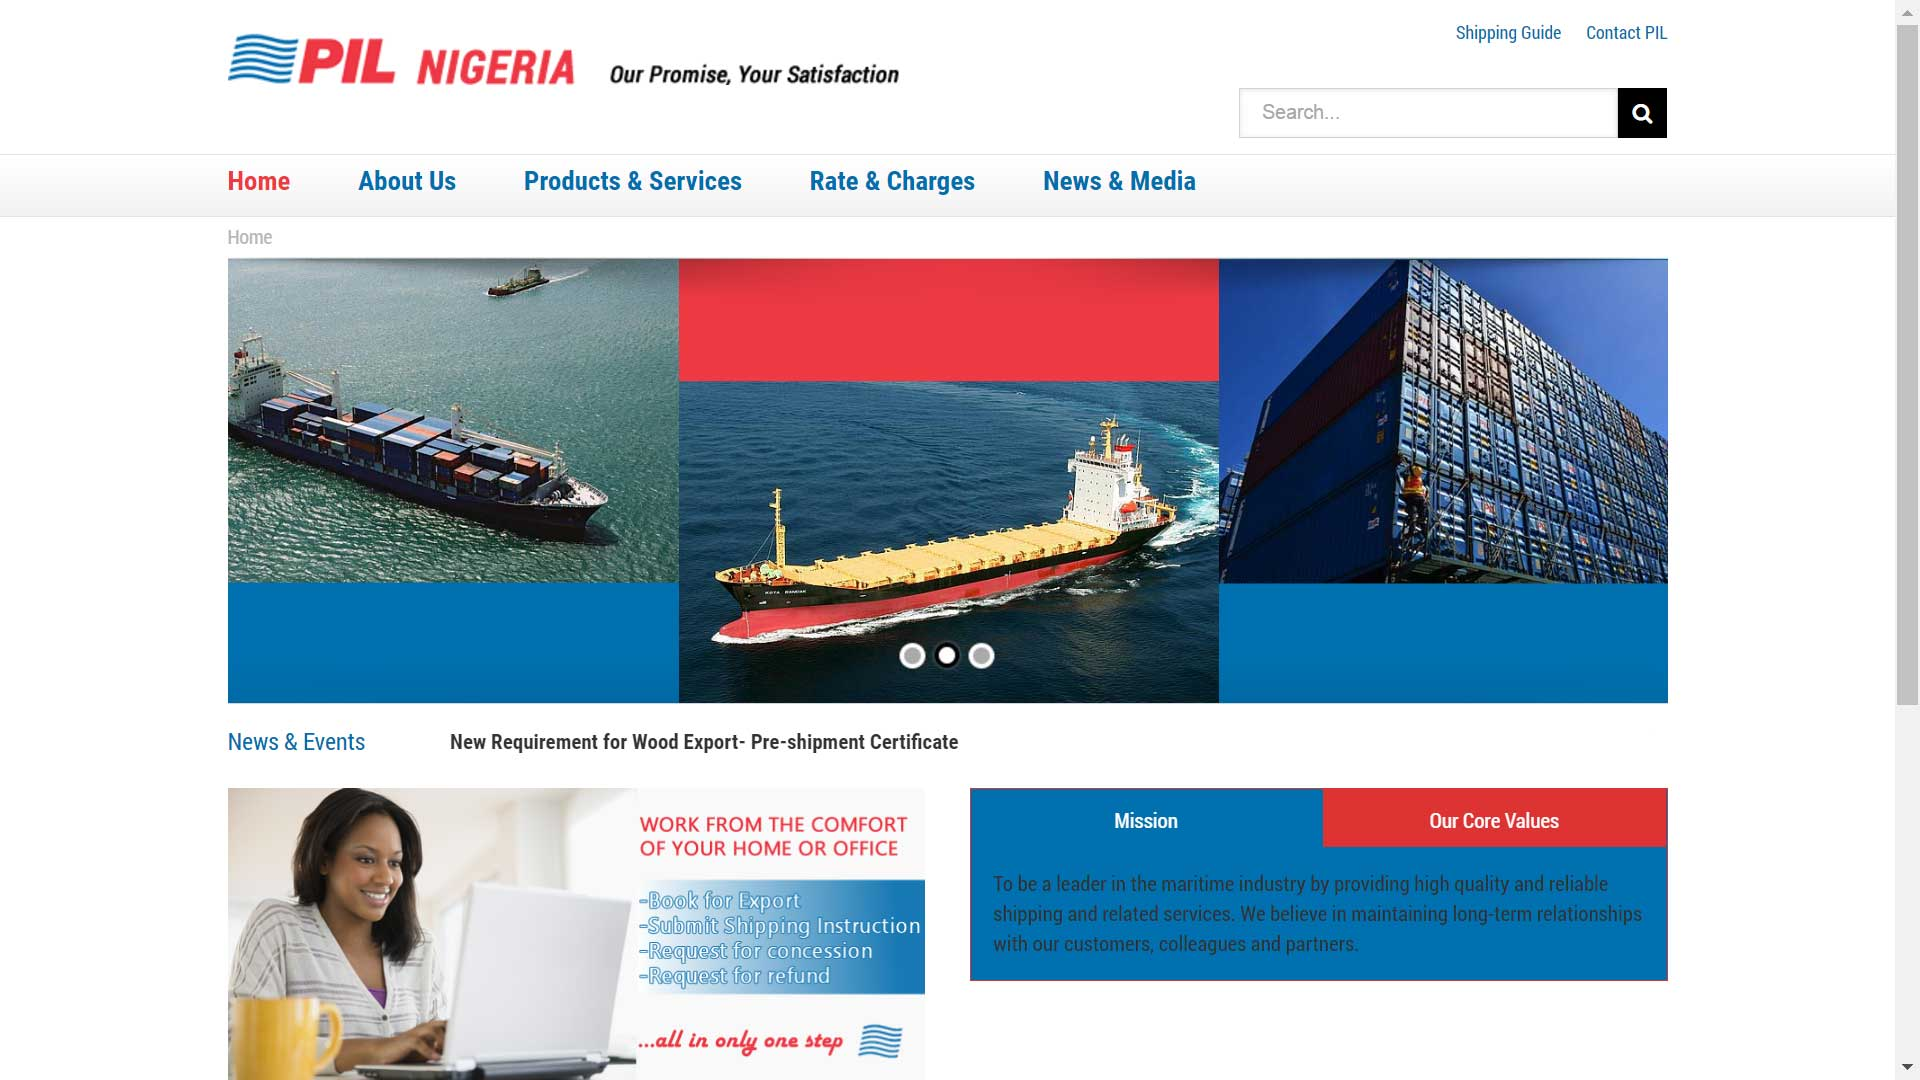 PIL Nigeria